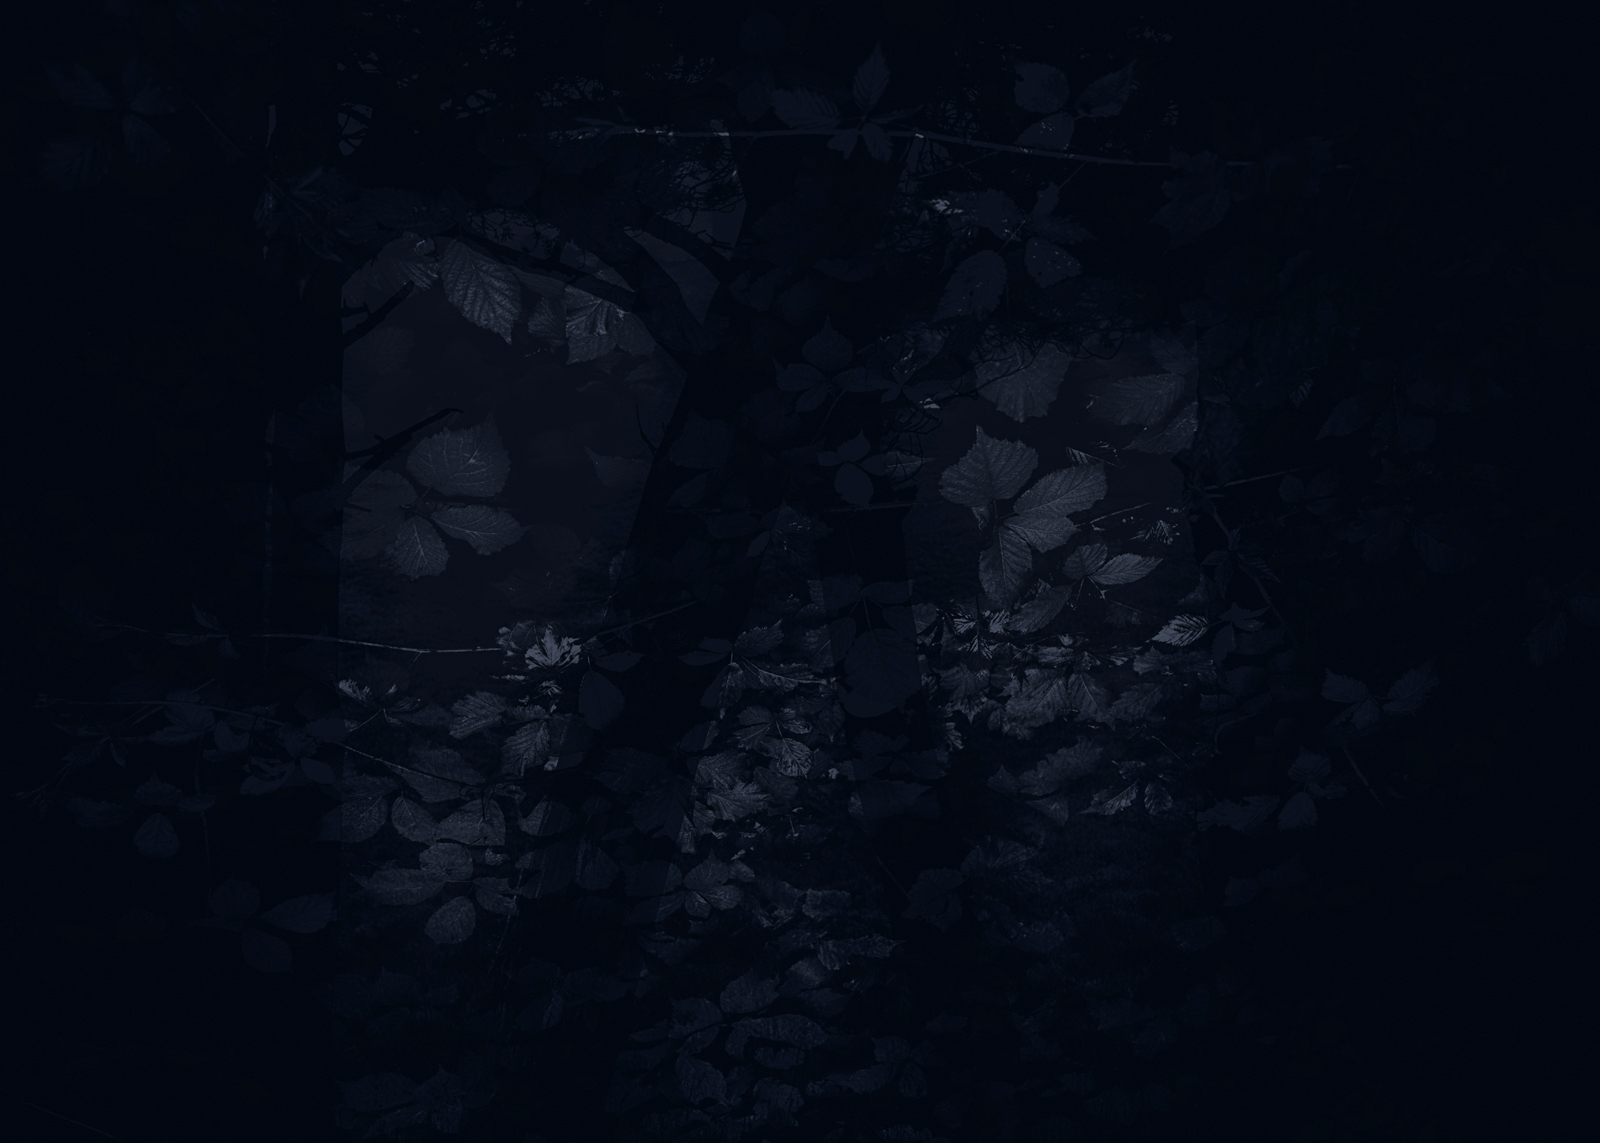 The shadow is all one darken and merged with lighten v2_28Nov2014_0039.jpg